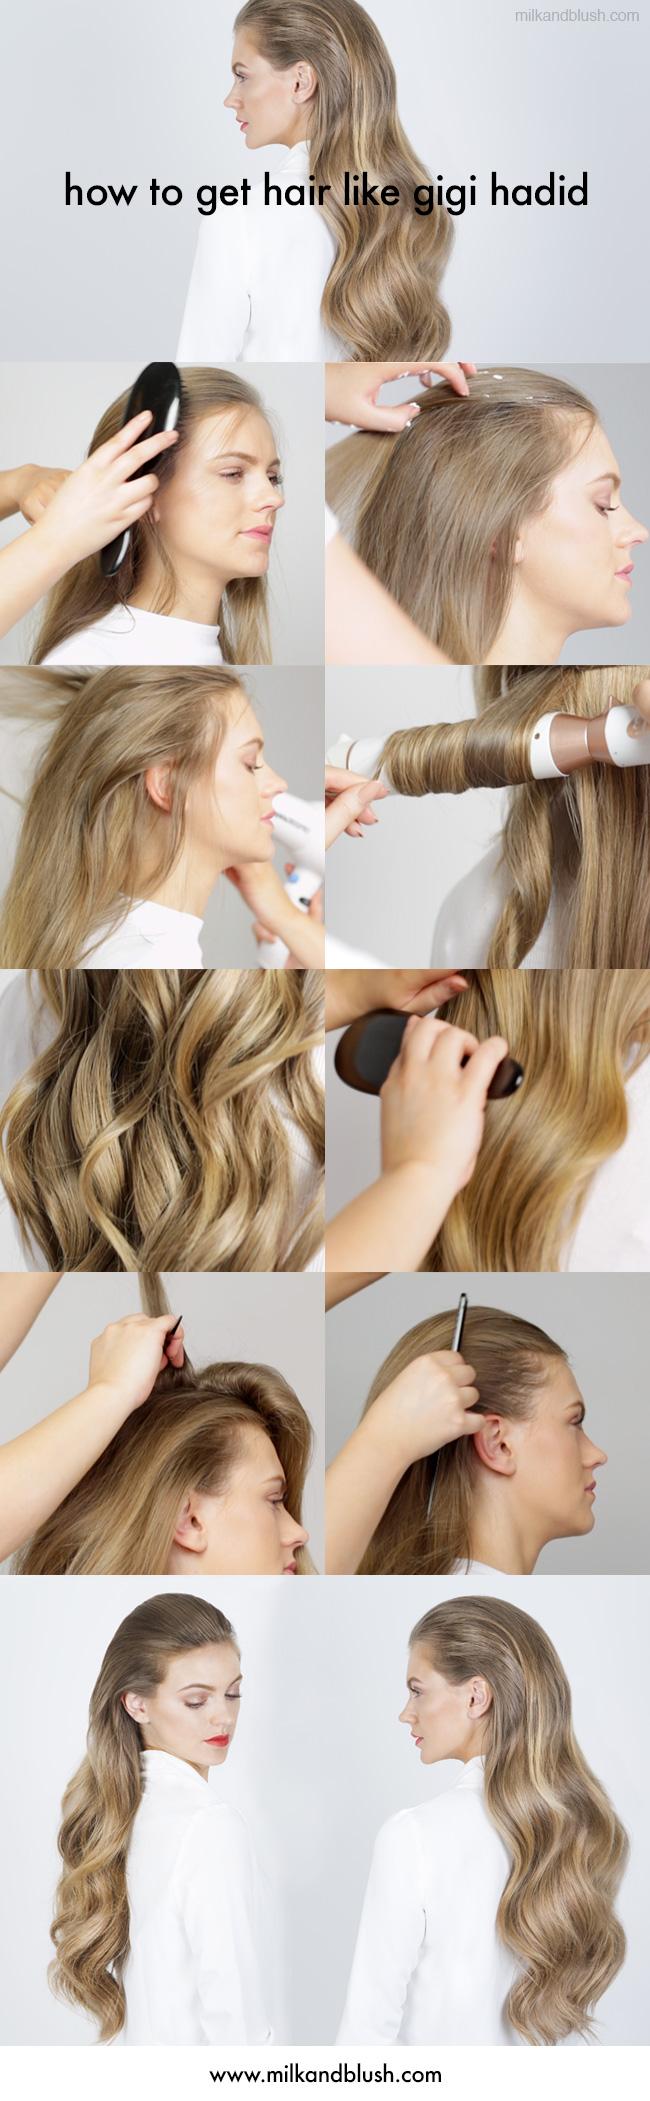 how-to-get-hair-like-gigi-hadid-tutorial